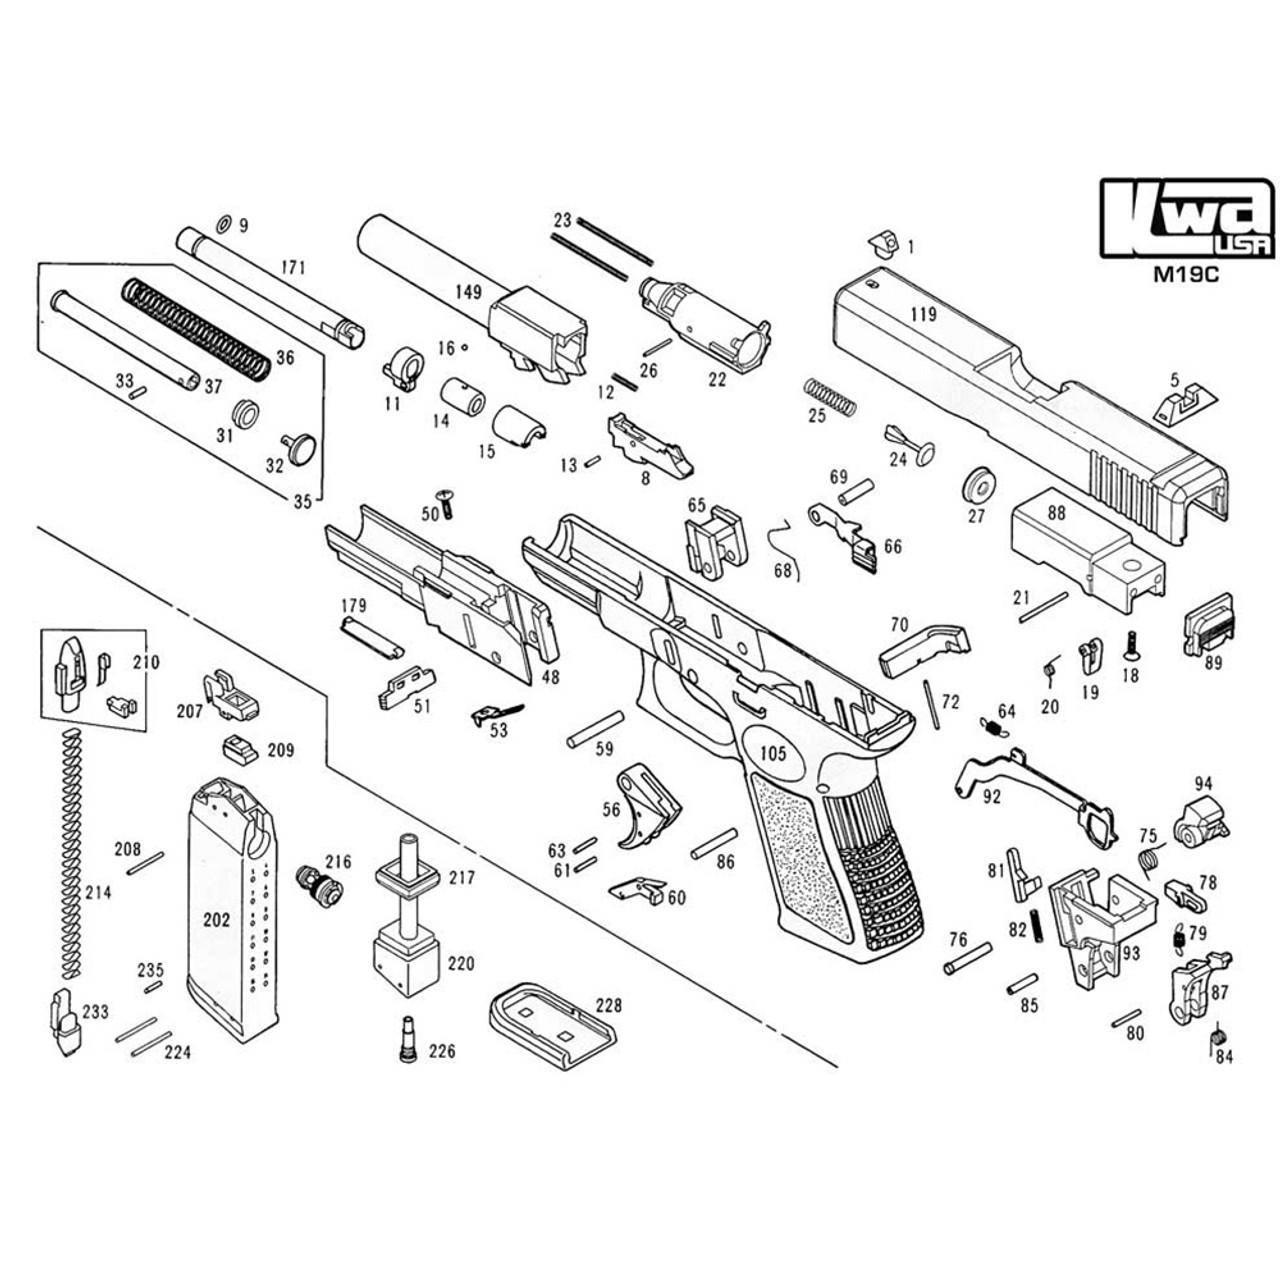 medium resolution of kwa airsoft m19c pistol diagram